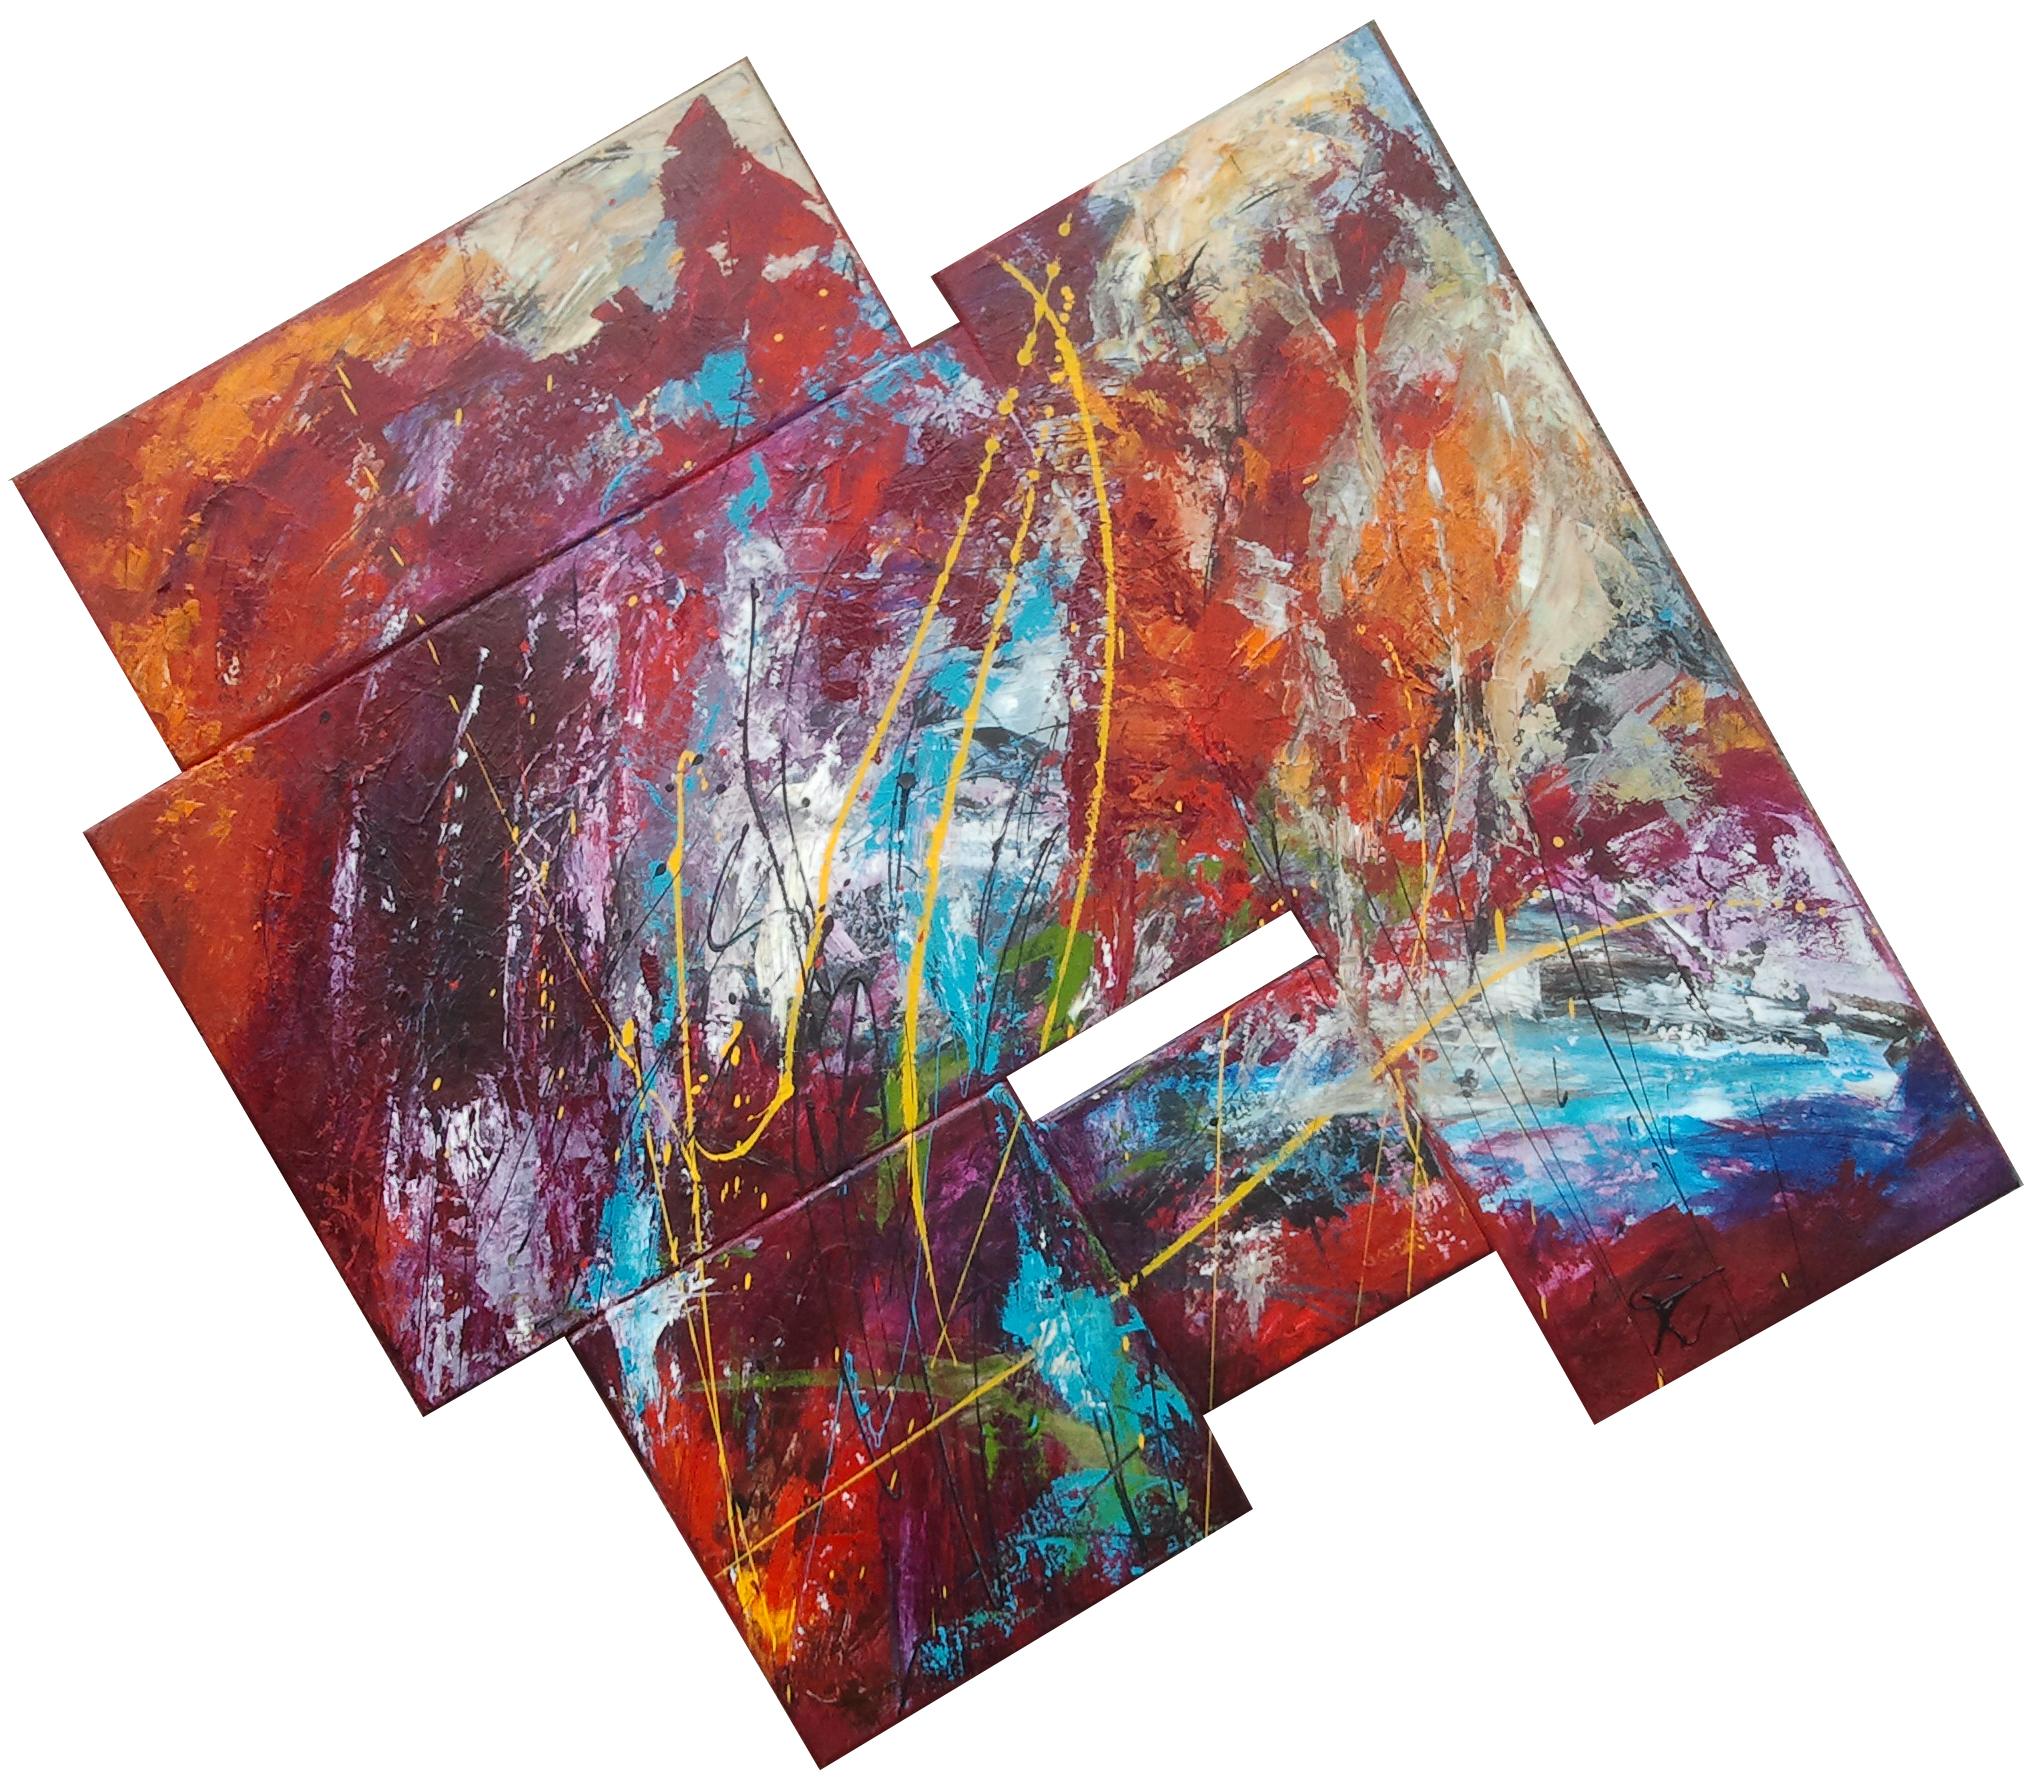 Wild Thing 110 x 120 cm € 1195